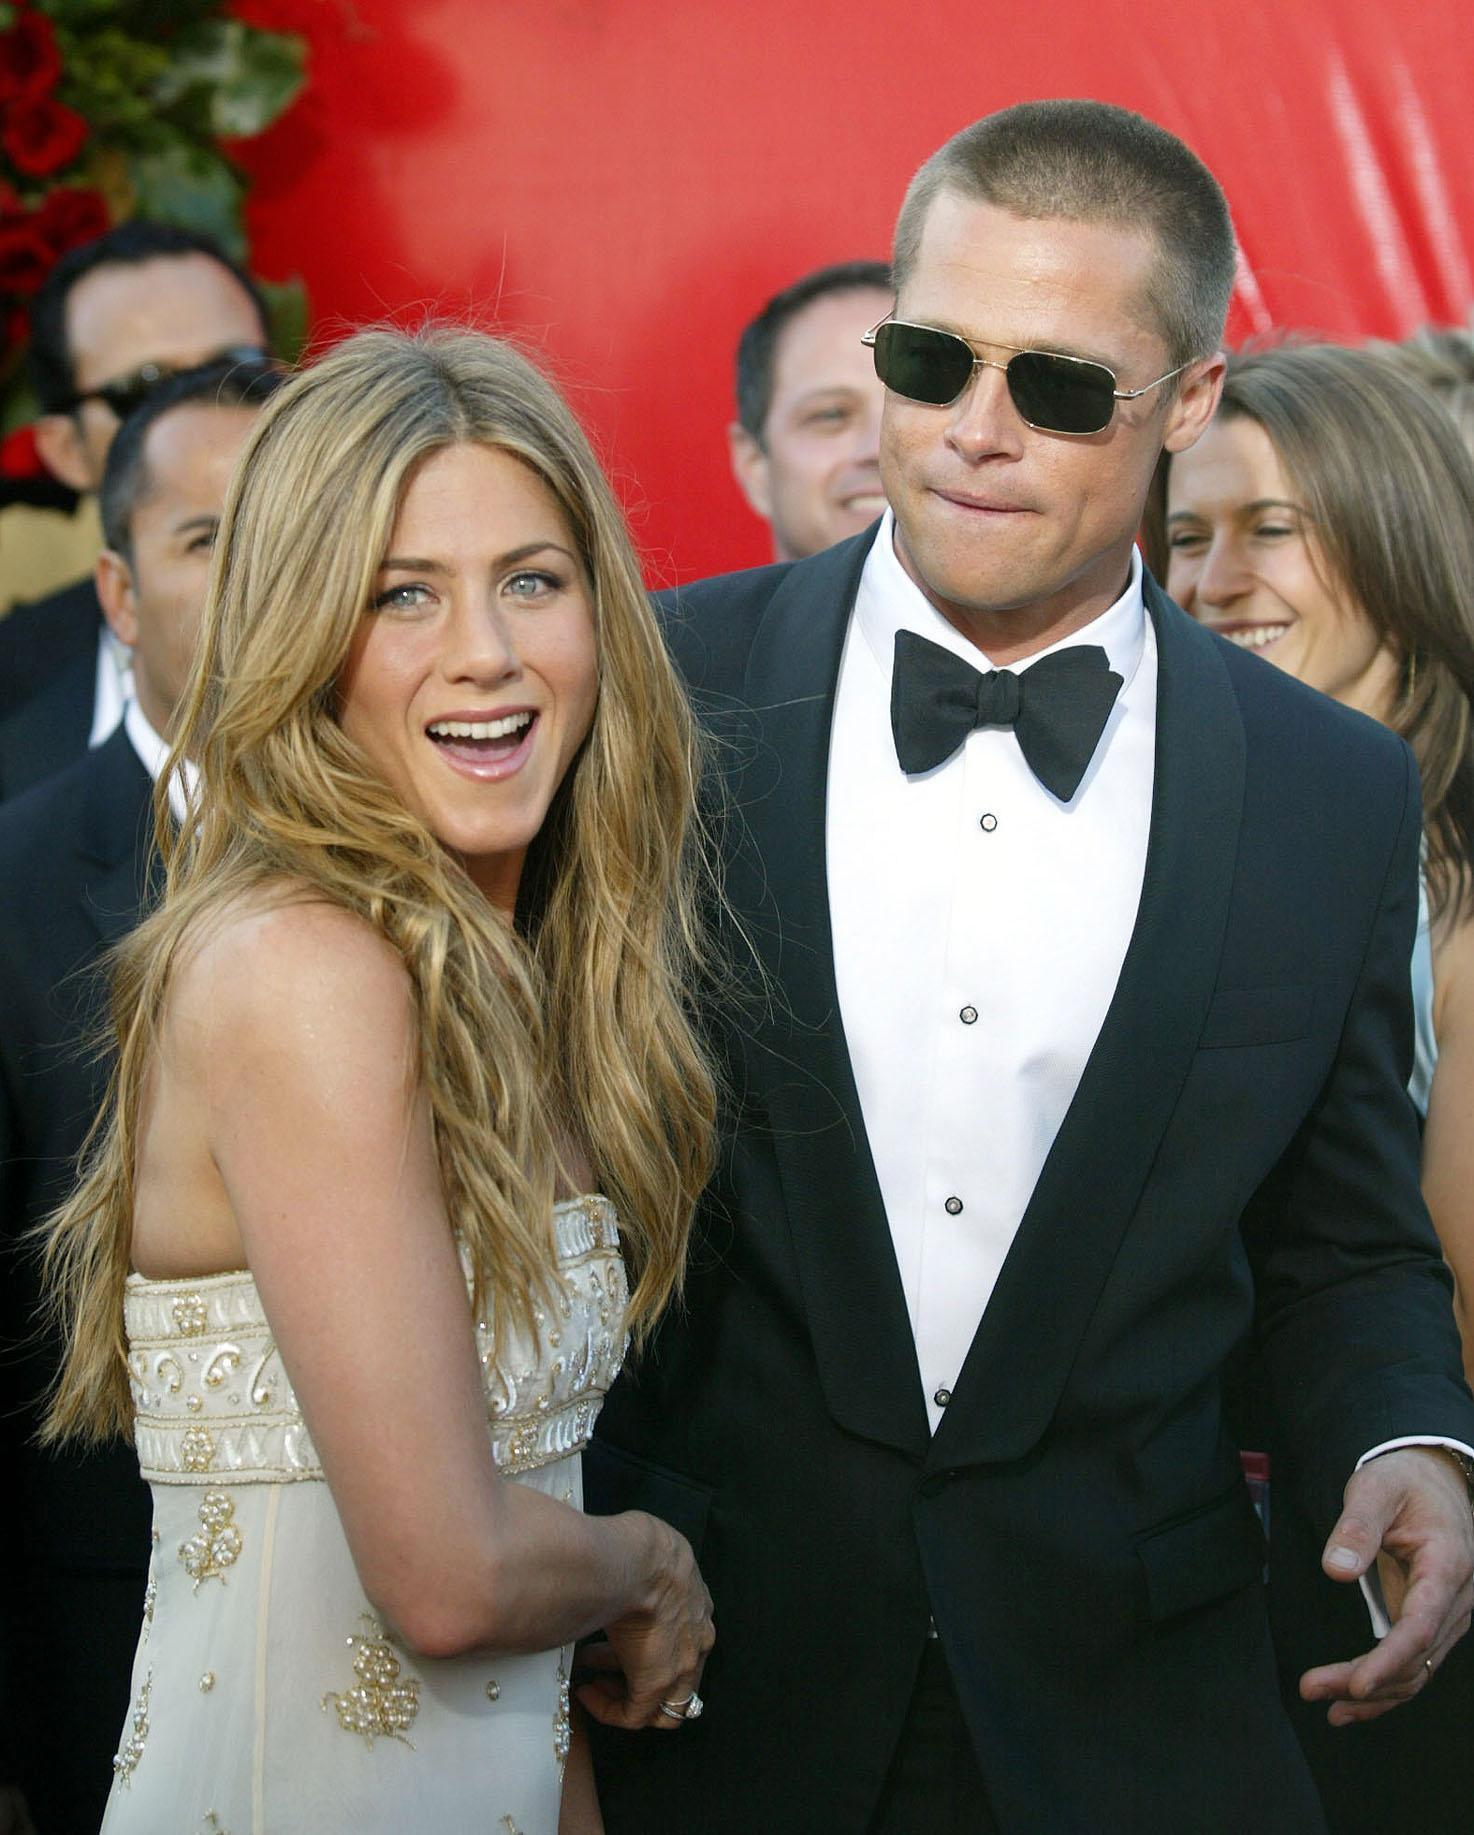 Jennifer Aniston and Husband Justin Theroux announce Separation